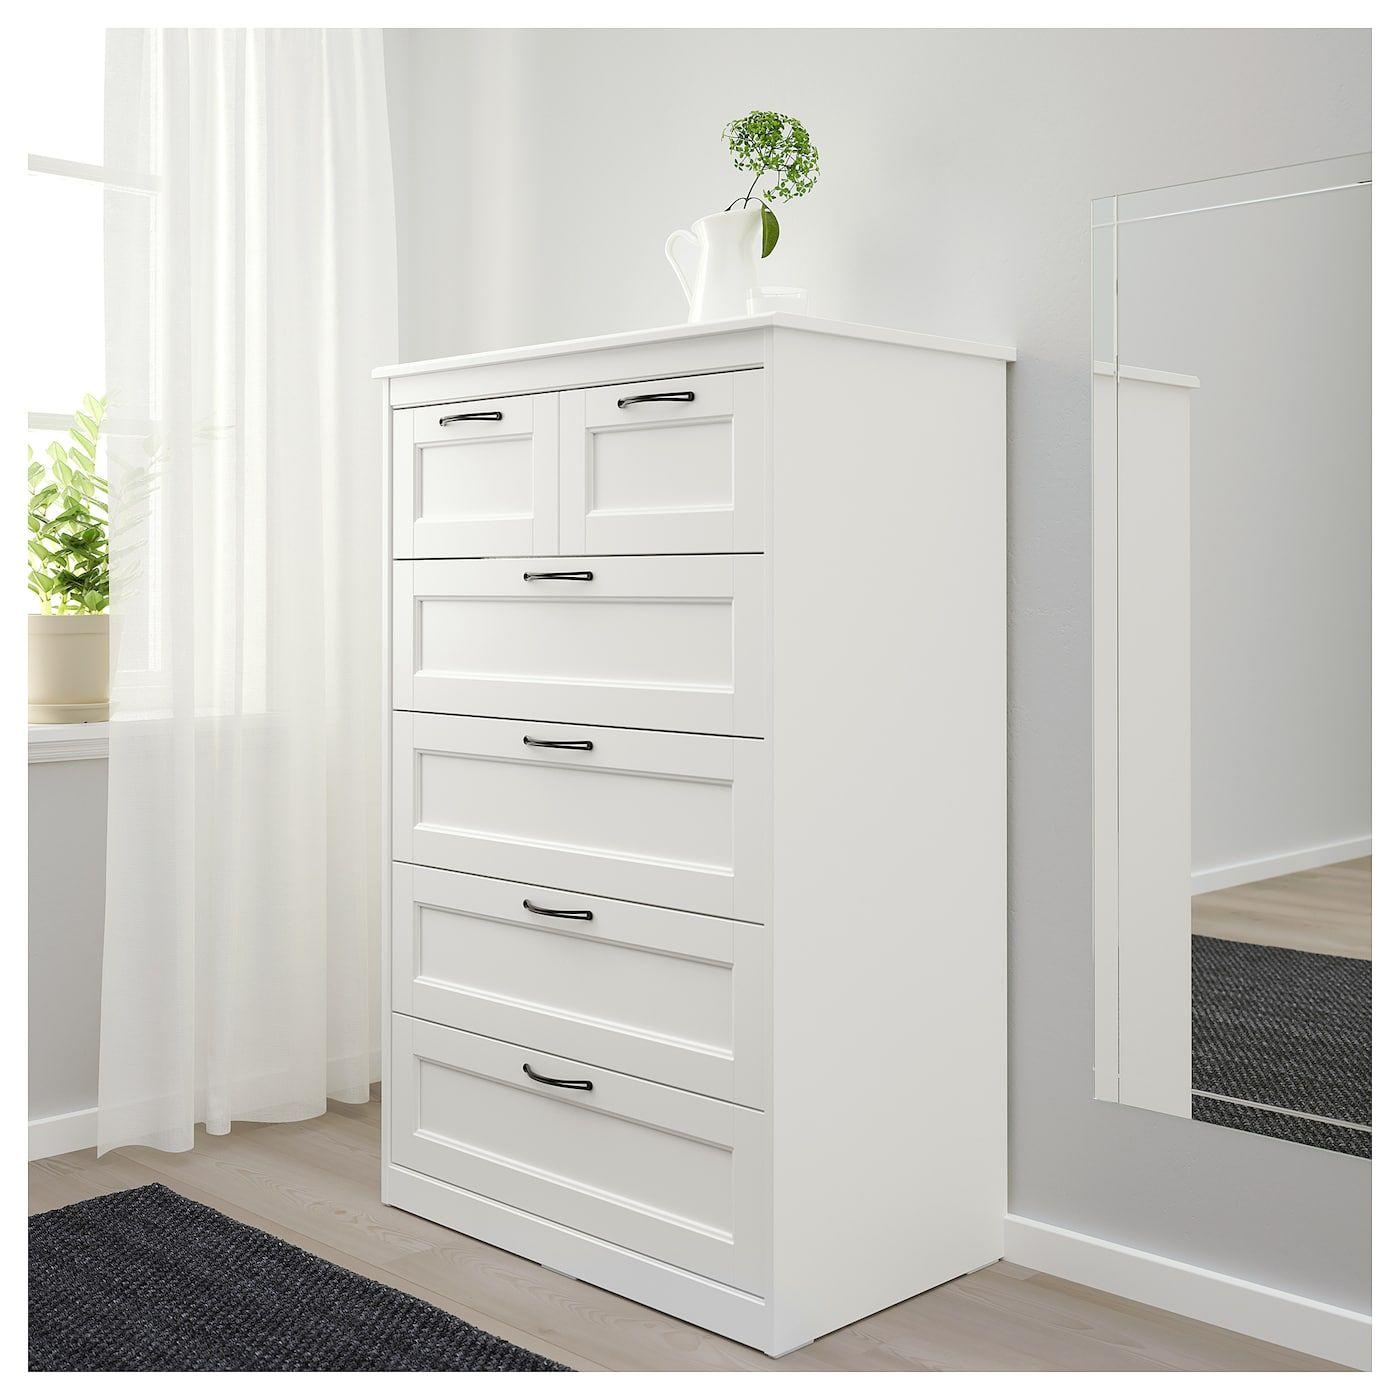 Https Www Ikea Com No No P Songesand Kommode 6 Skuffer Hvit 90366783 Ikea Bedroom Chest Of Drawers White Chests 6 Drawer Chest [ 1400 x 1400 Pixel ]